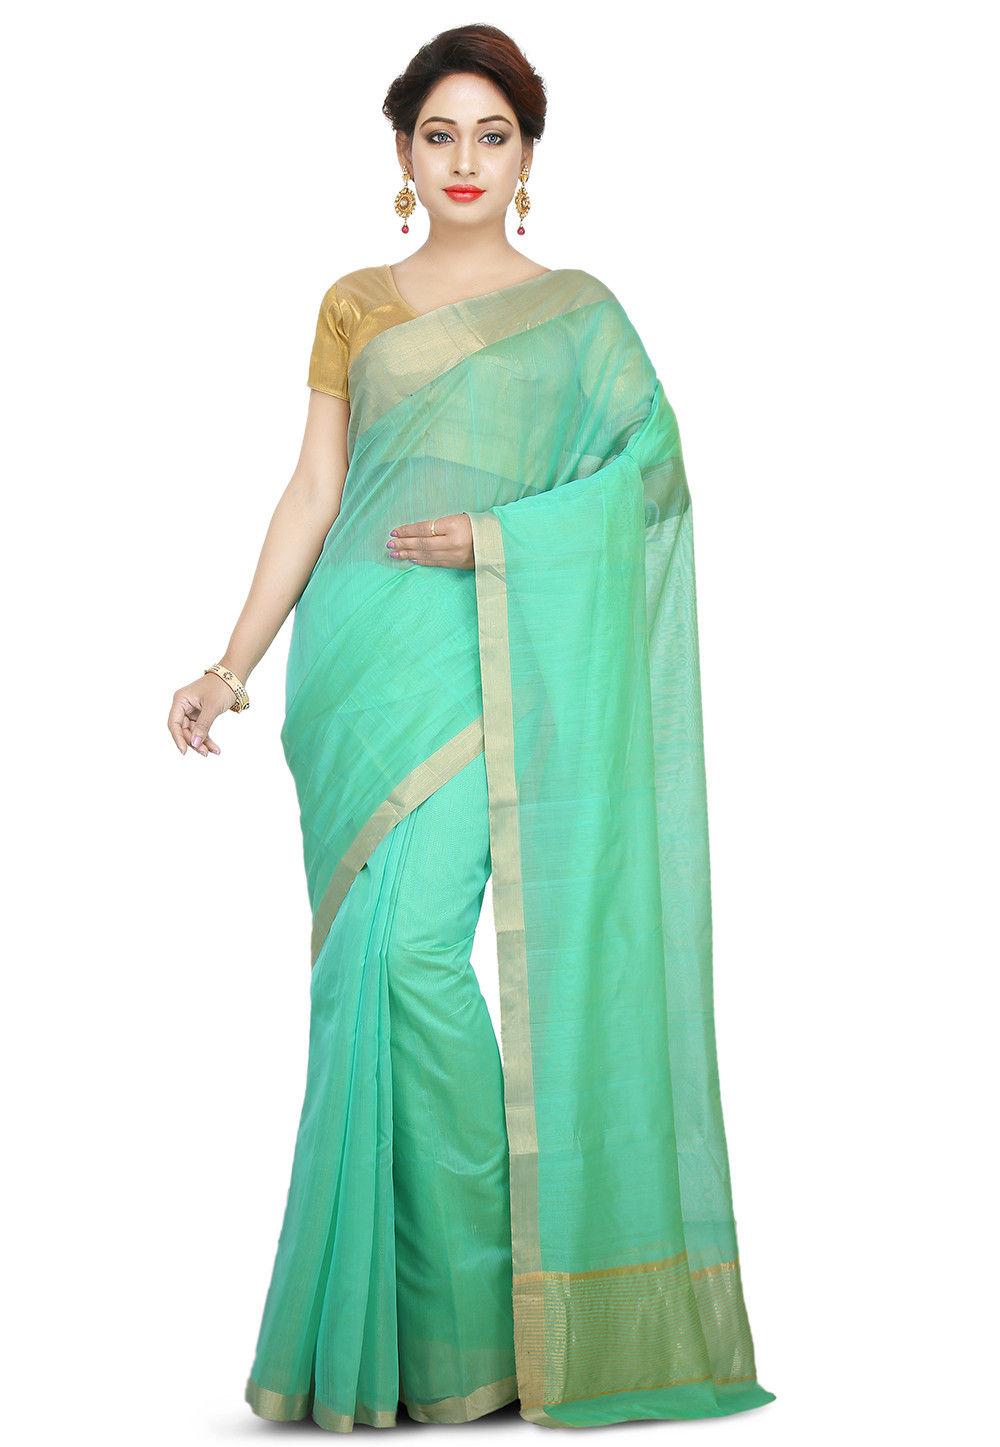 Chanderi Silk Saree in Light Teal Green